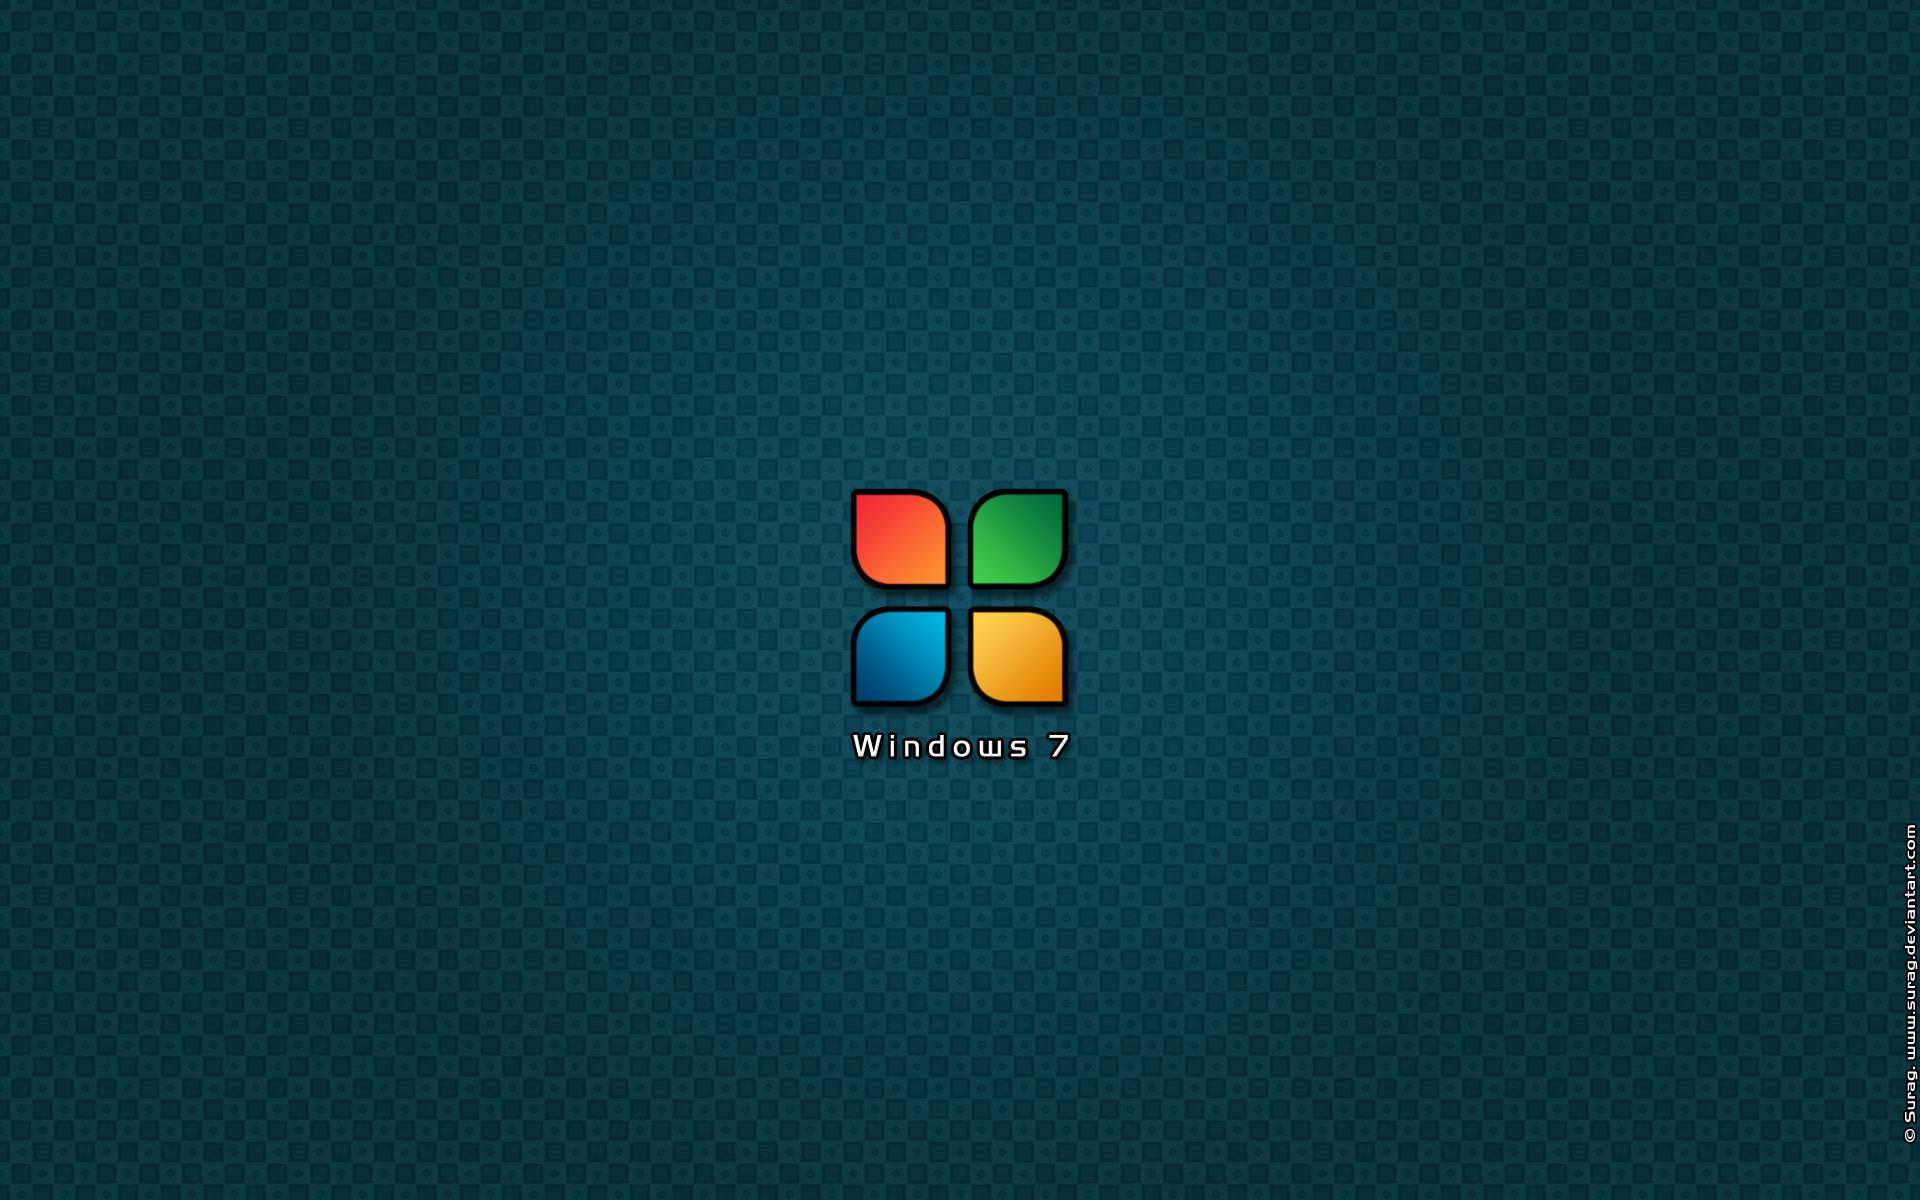 Minimal Windows 7 Wallpaper By Surag